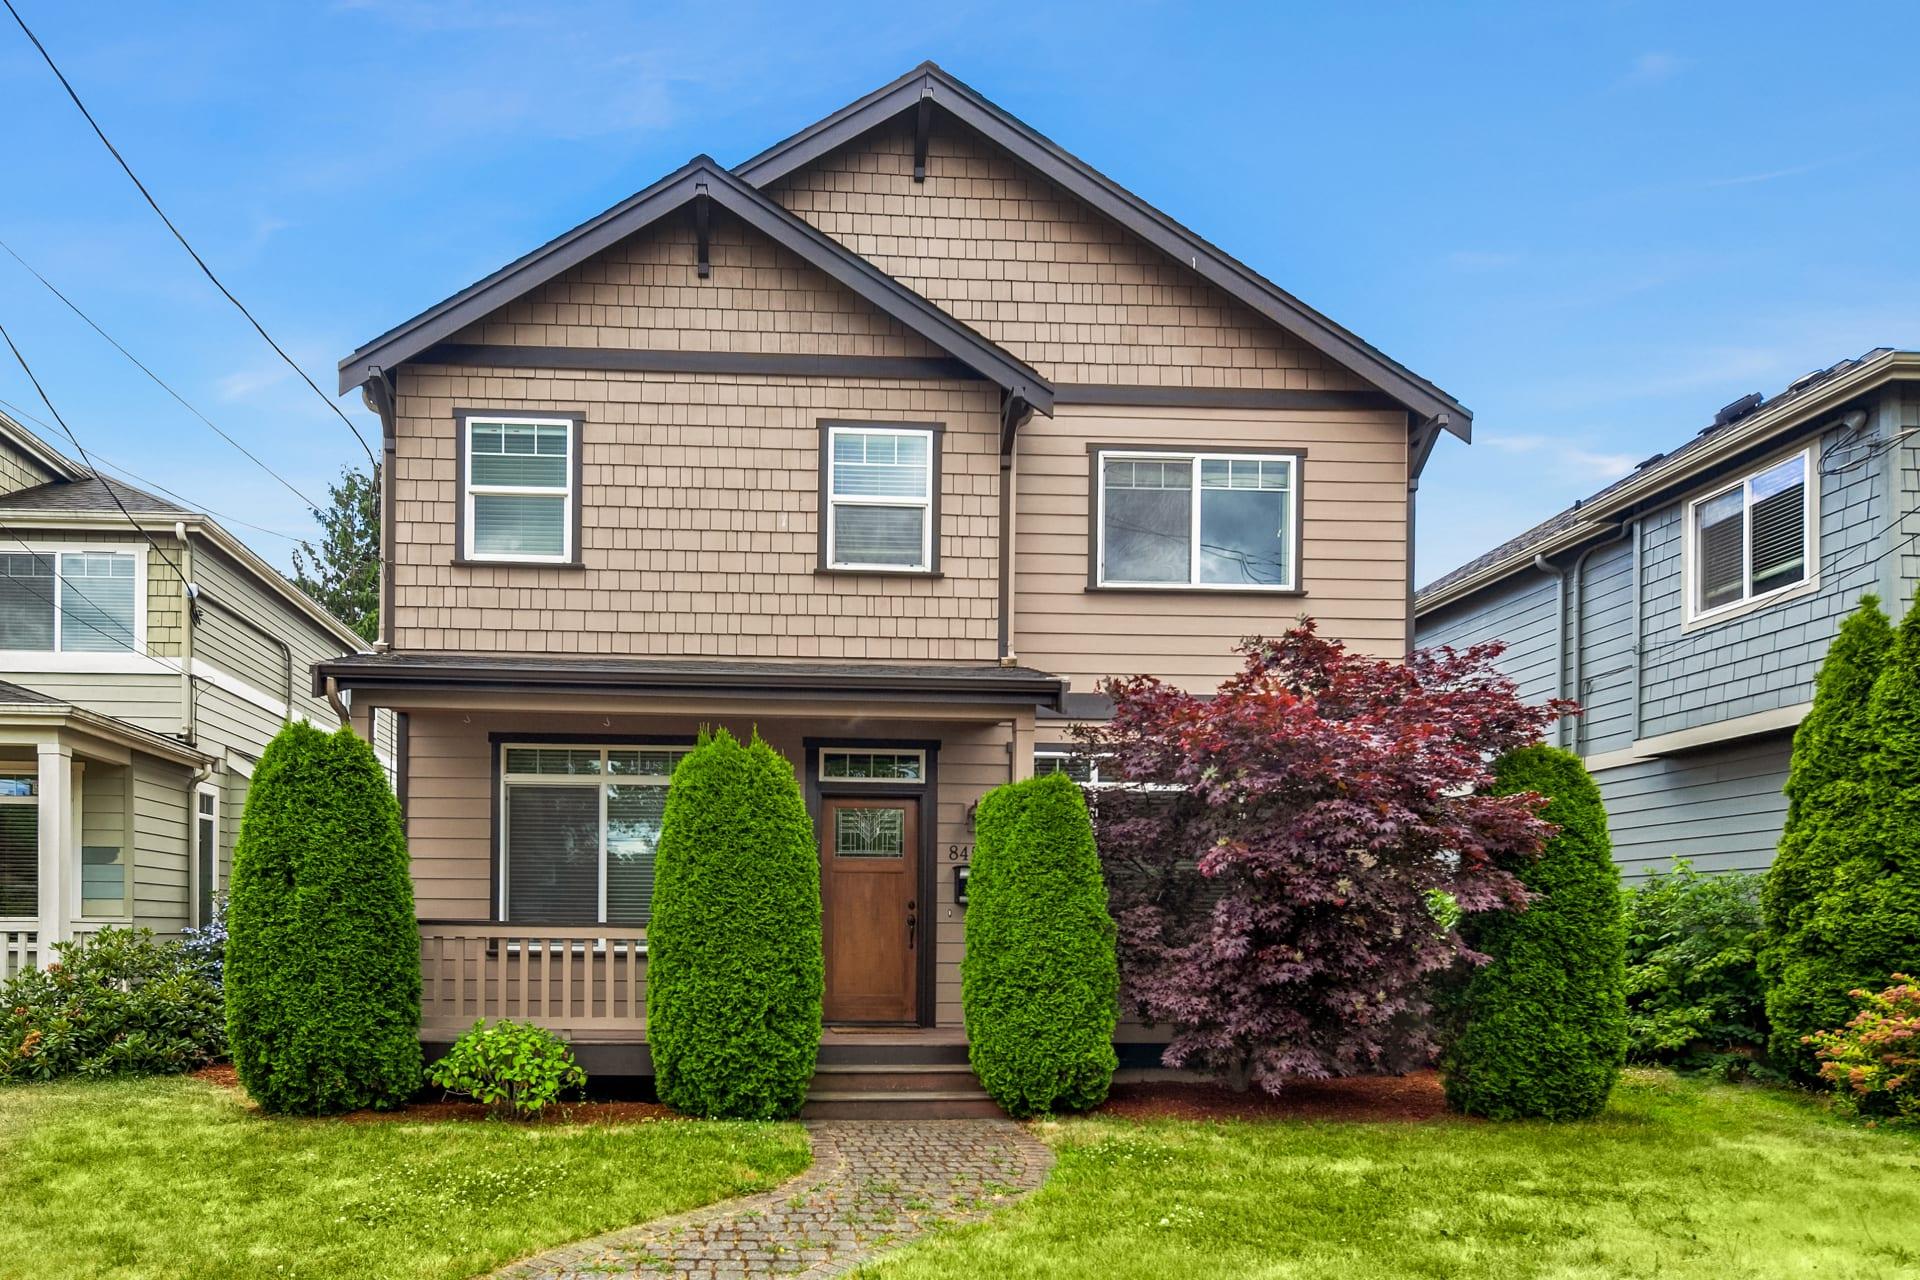 8459 Seward Park Ave S, Seattle 98118 photo